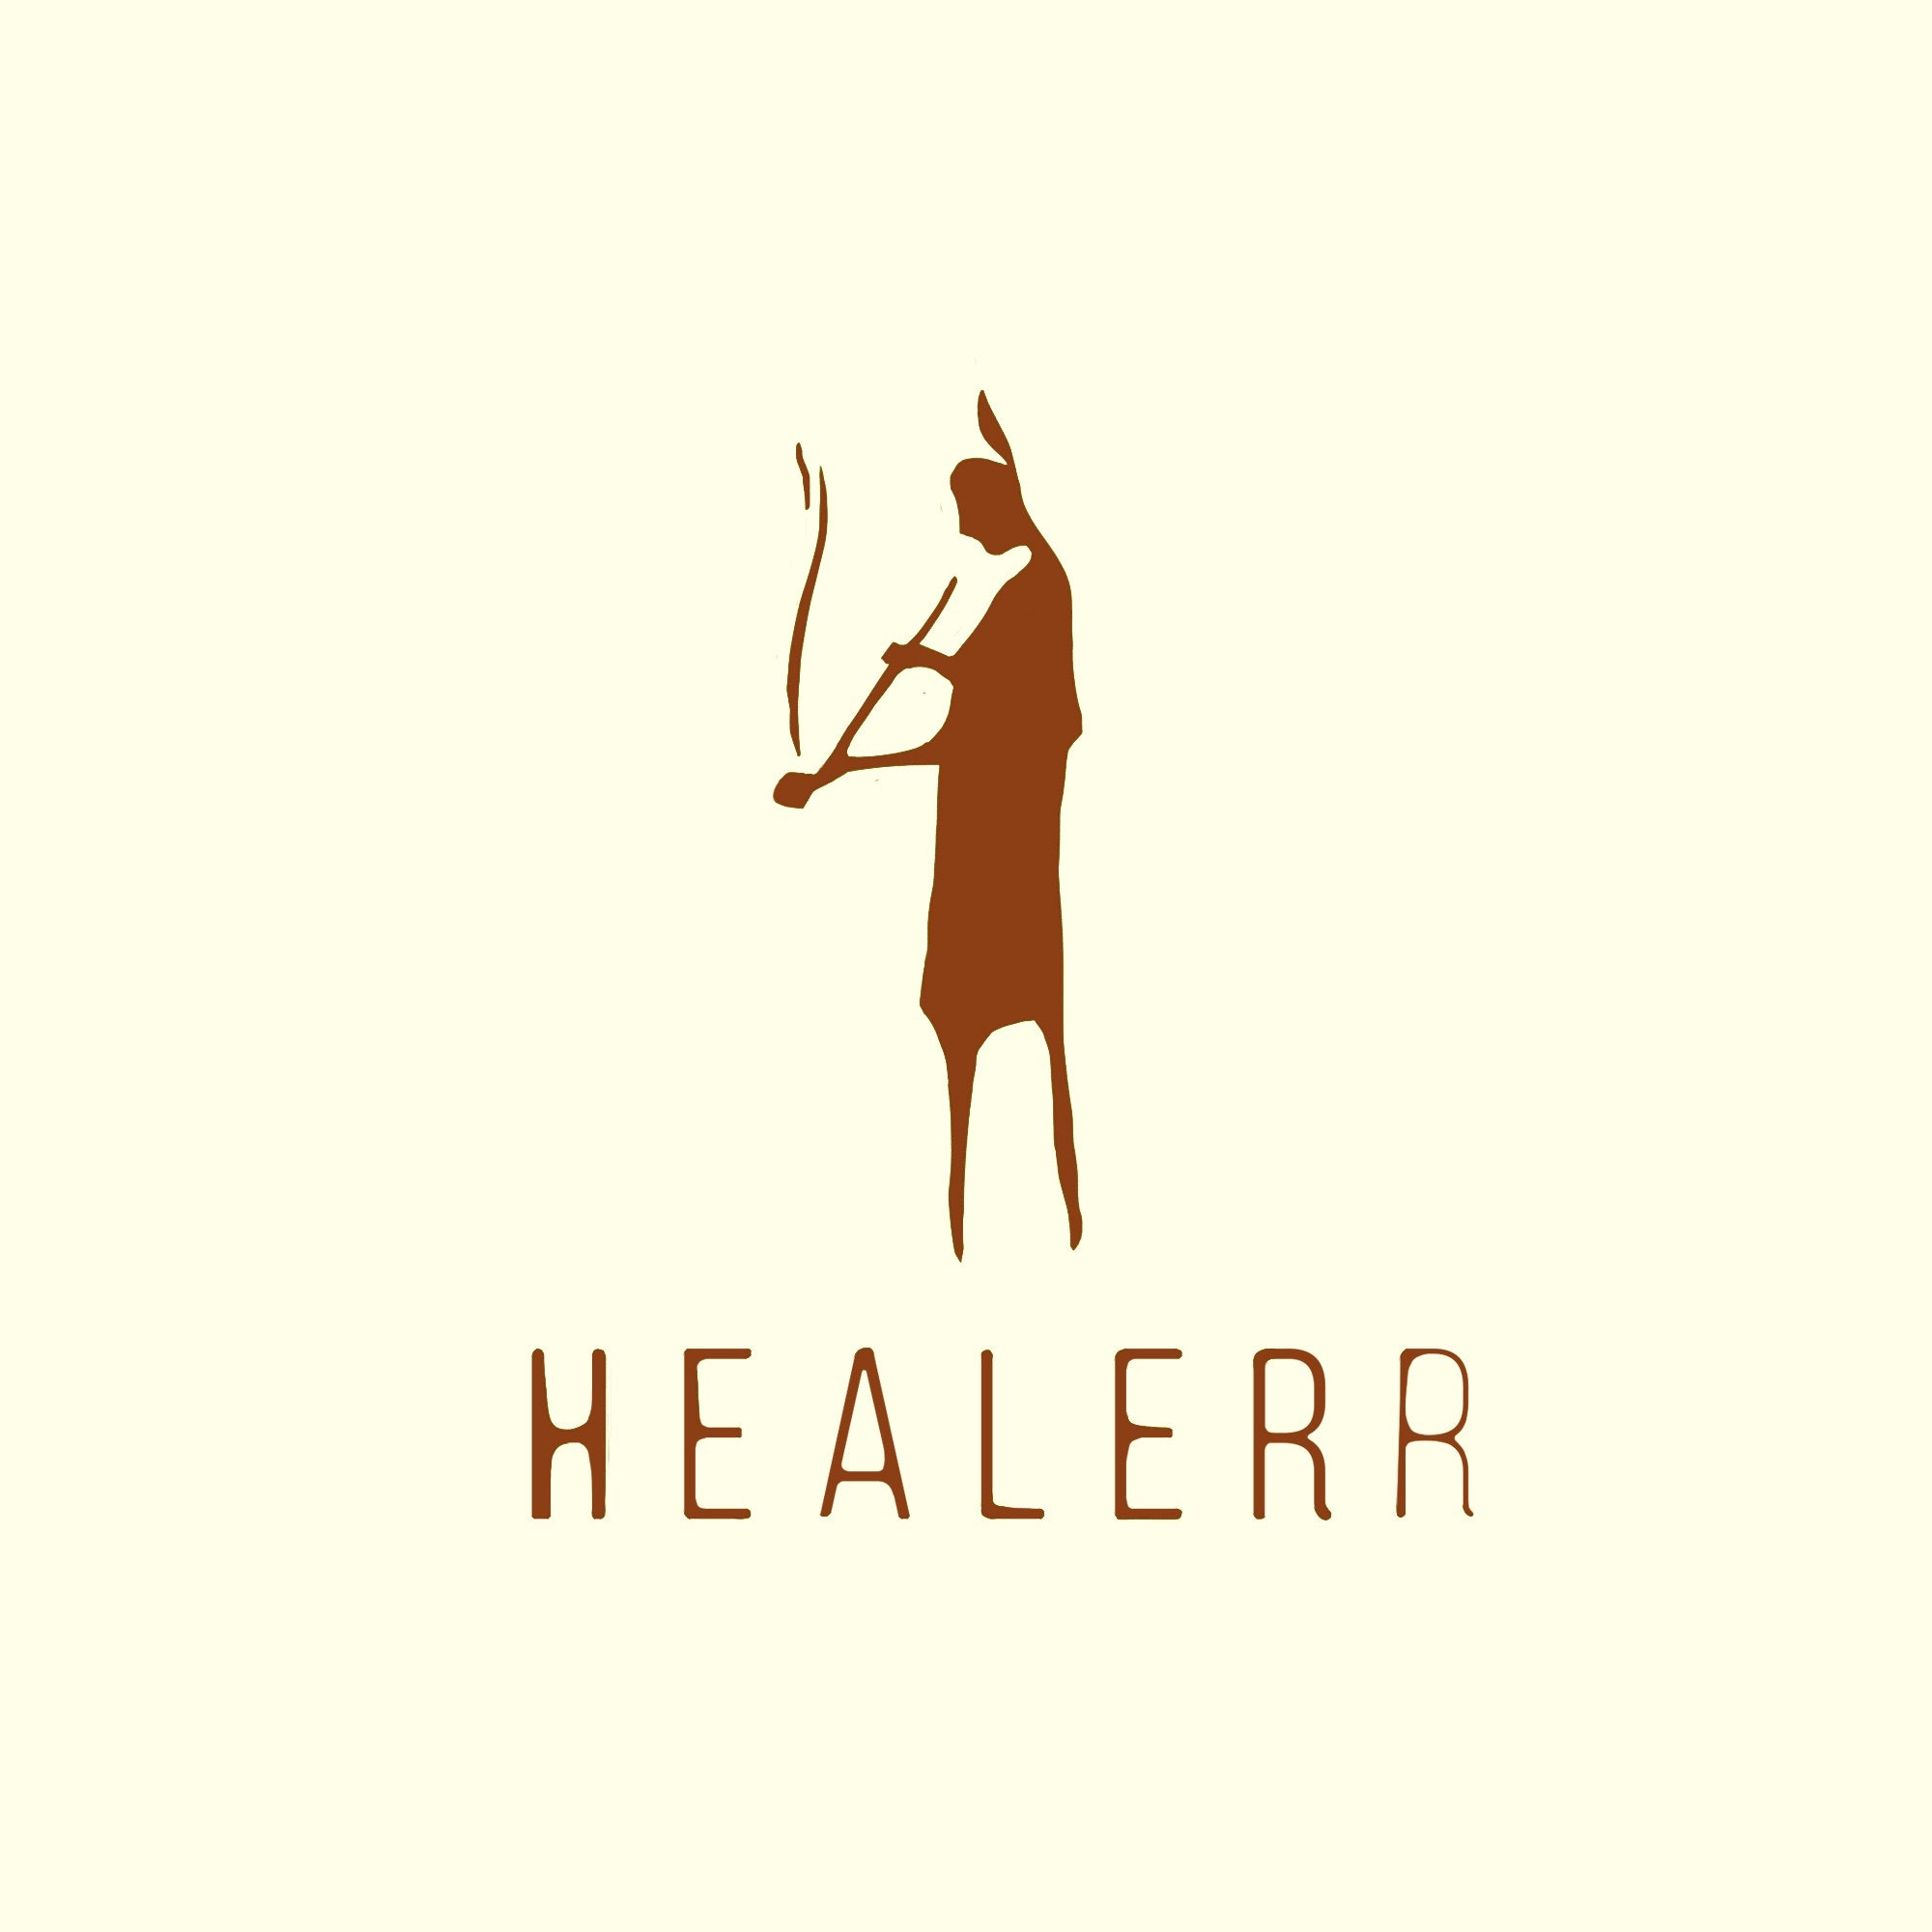 Healerr logo